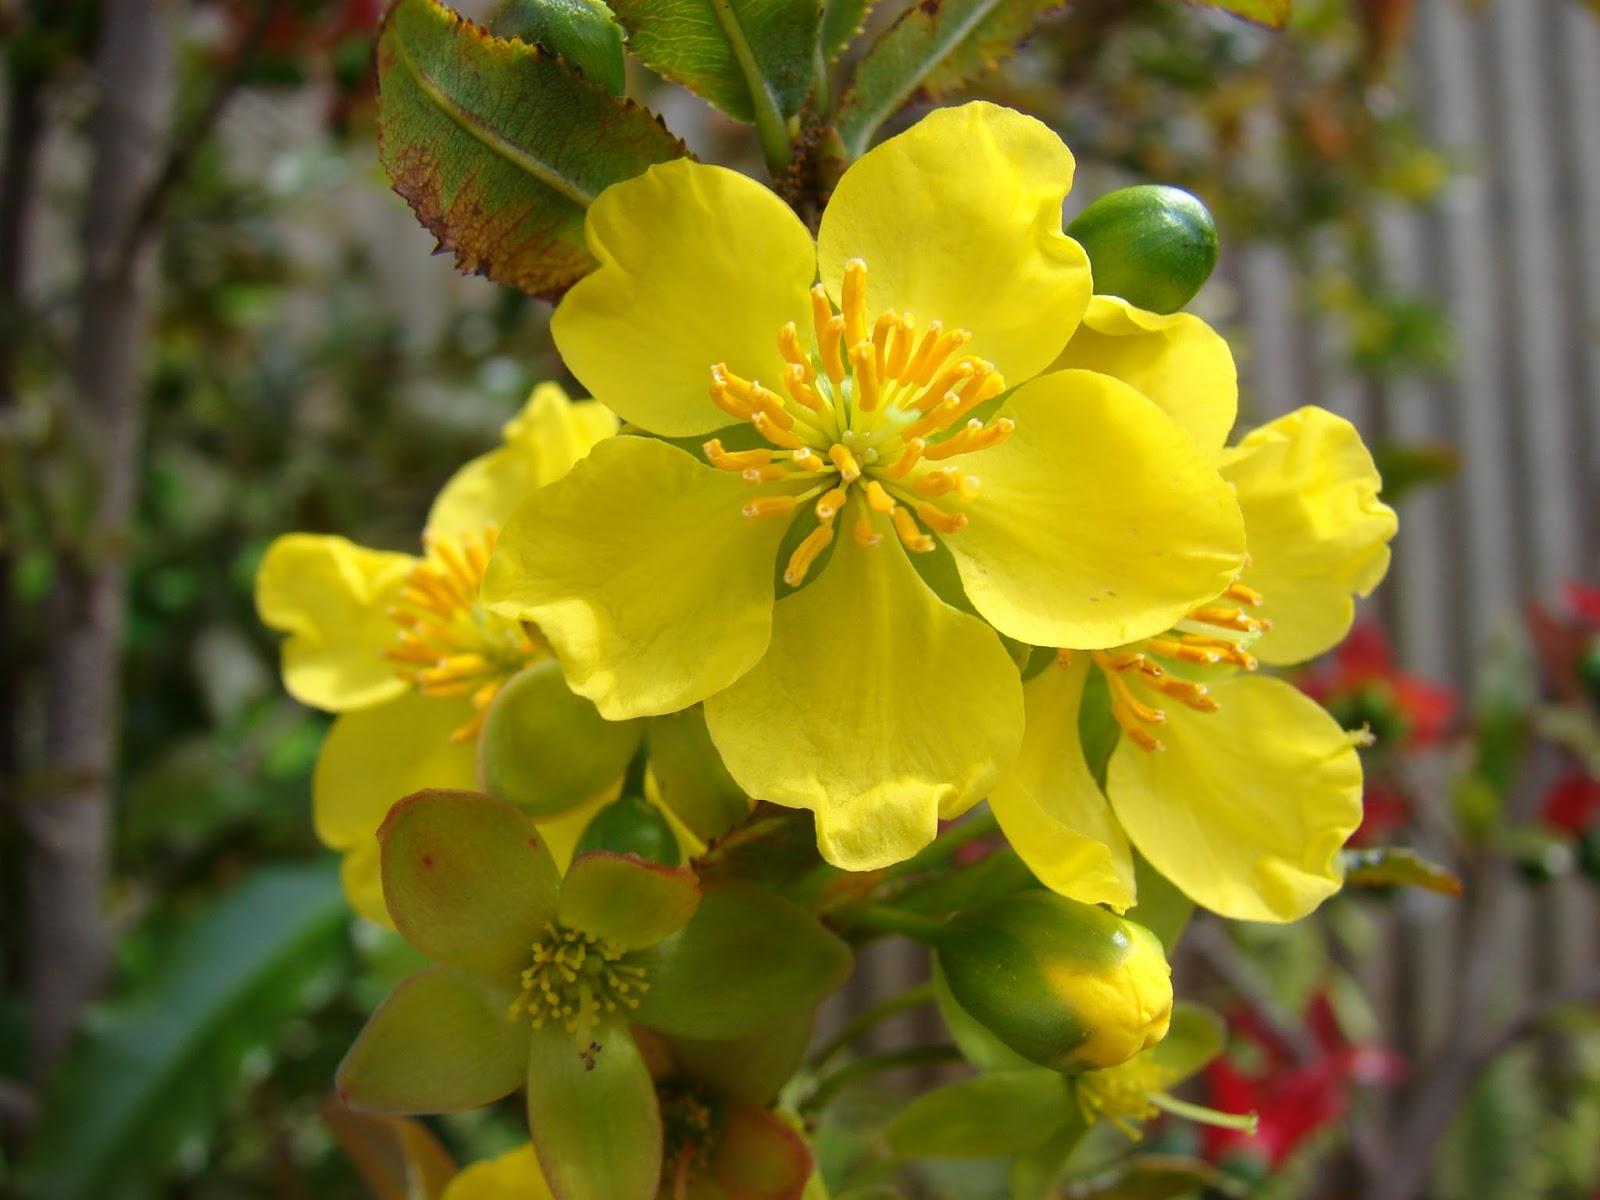 ảnh hoa mai hoa đào